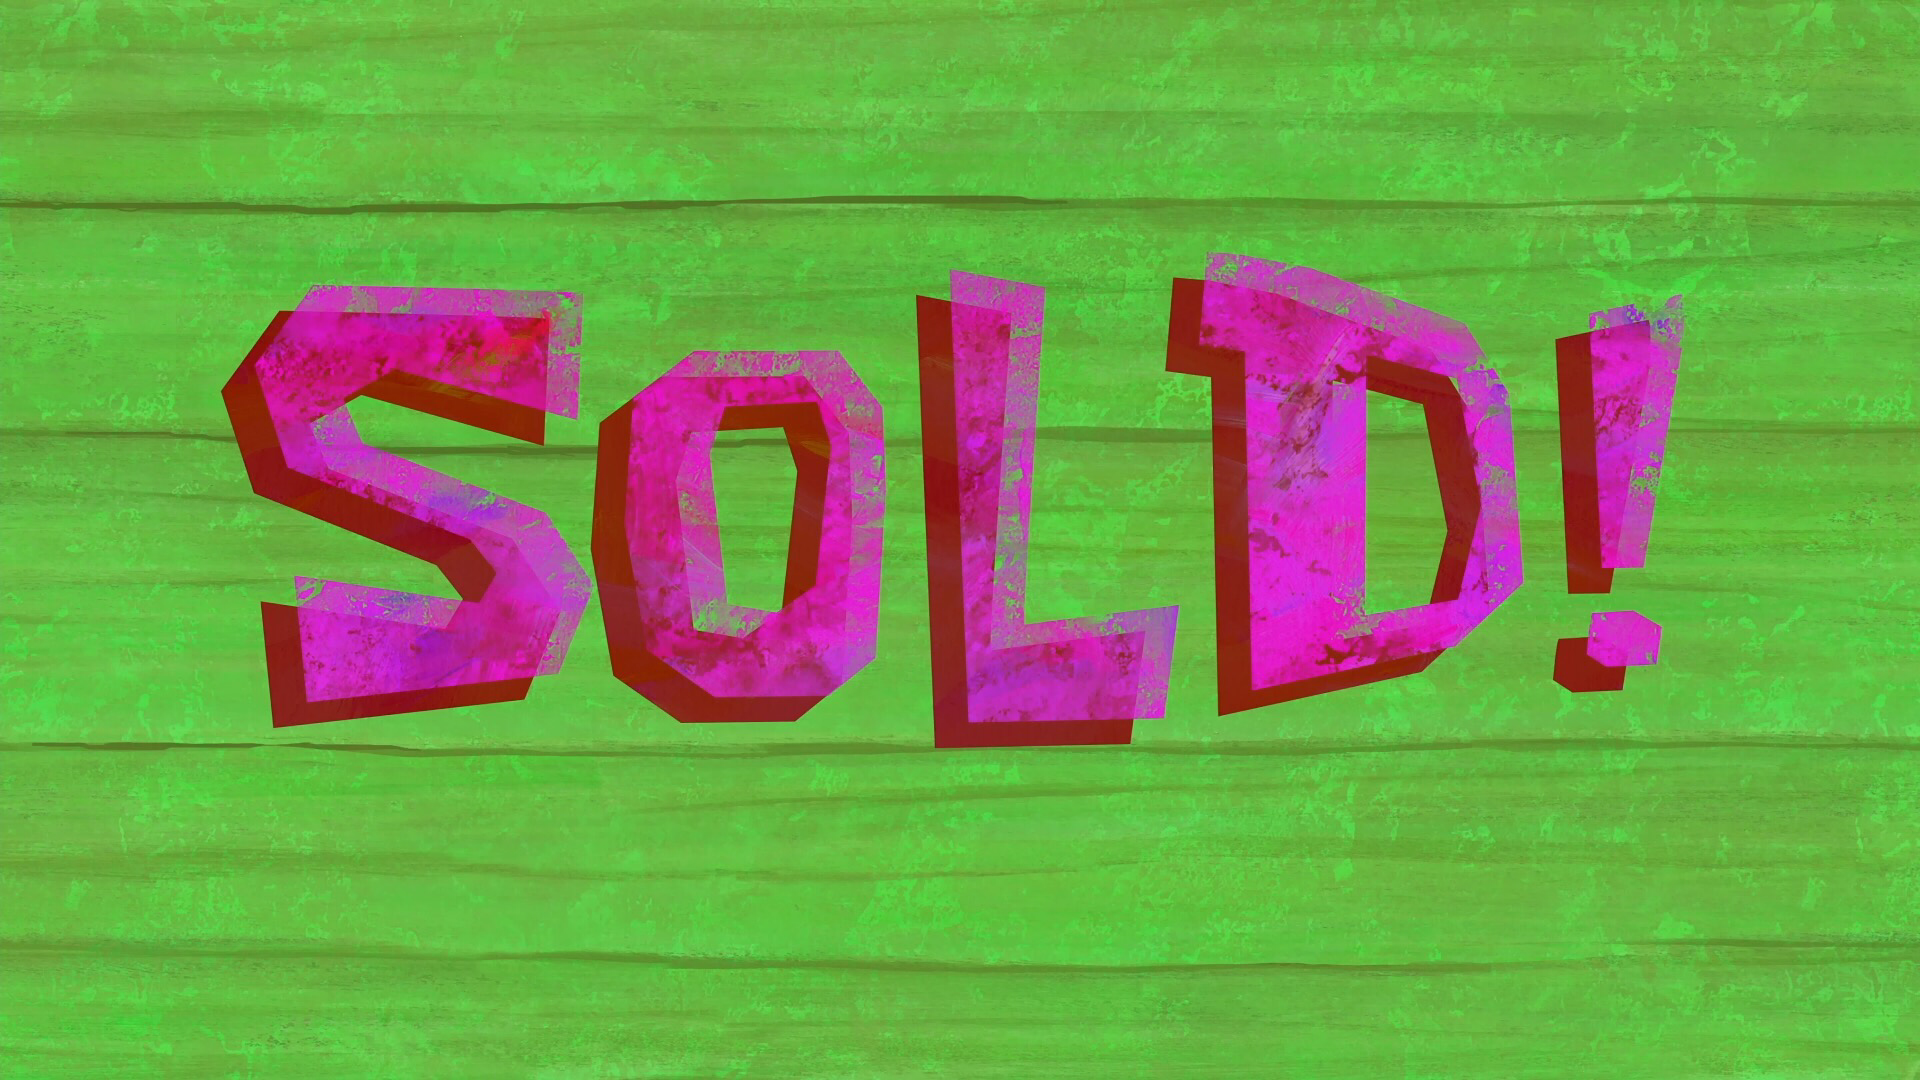 File:SoldTitleCard.png